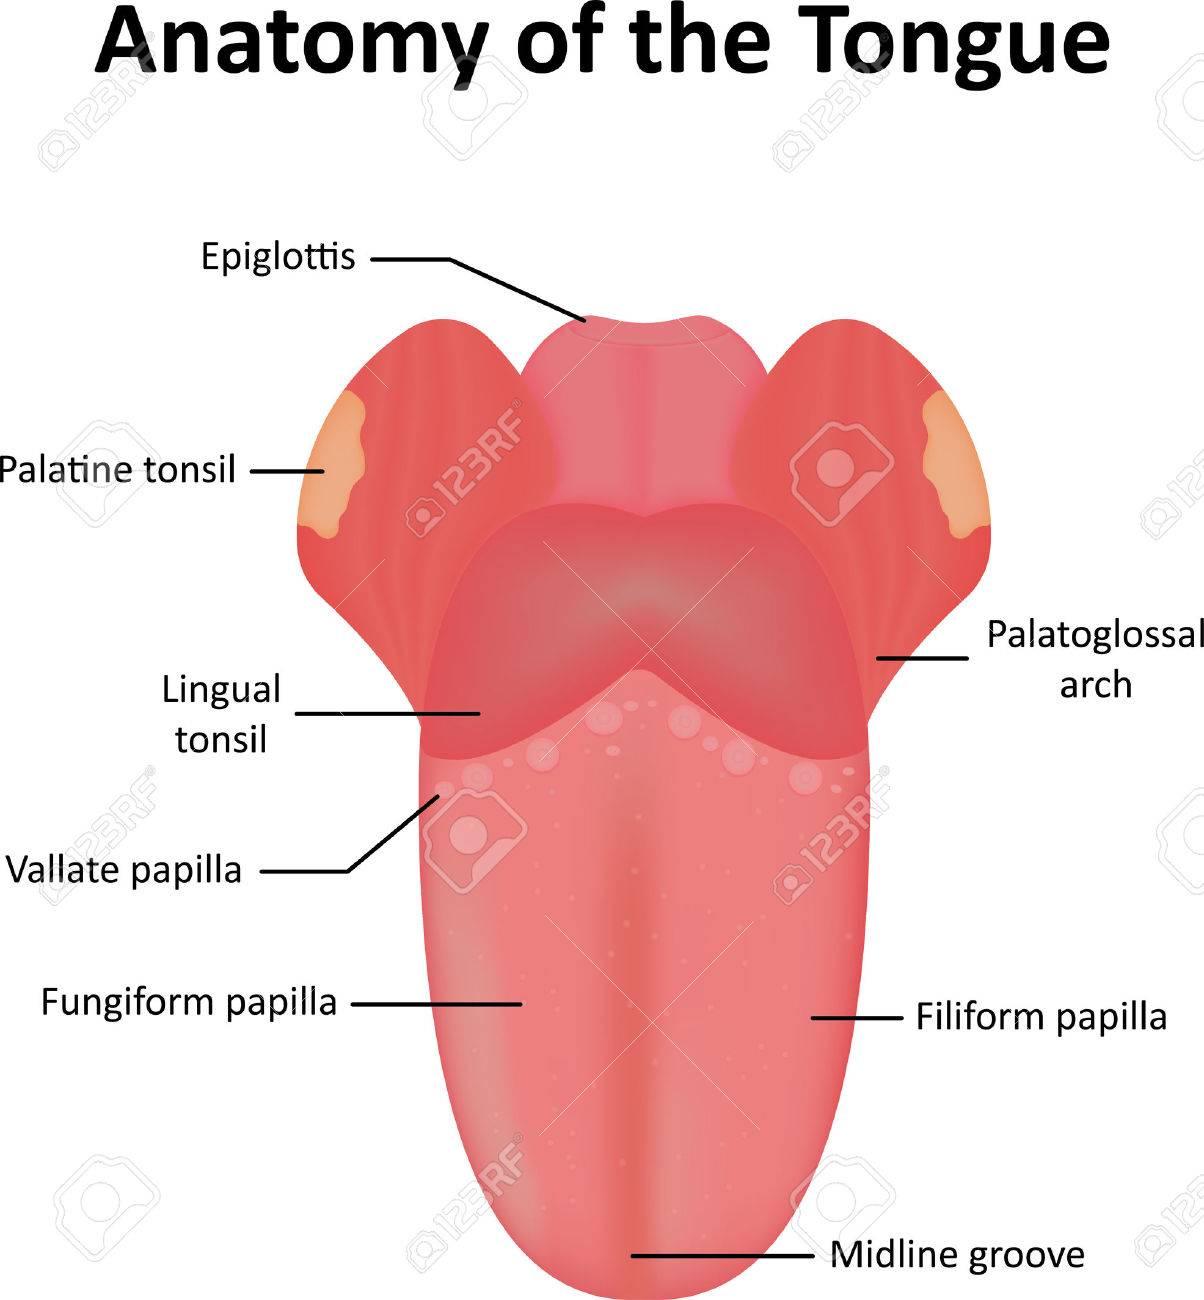 Anatomy Of The Tongue Vatozozdevelopment